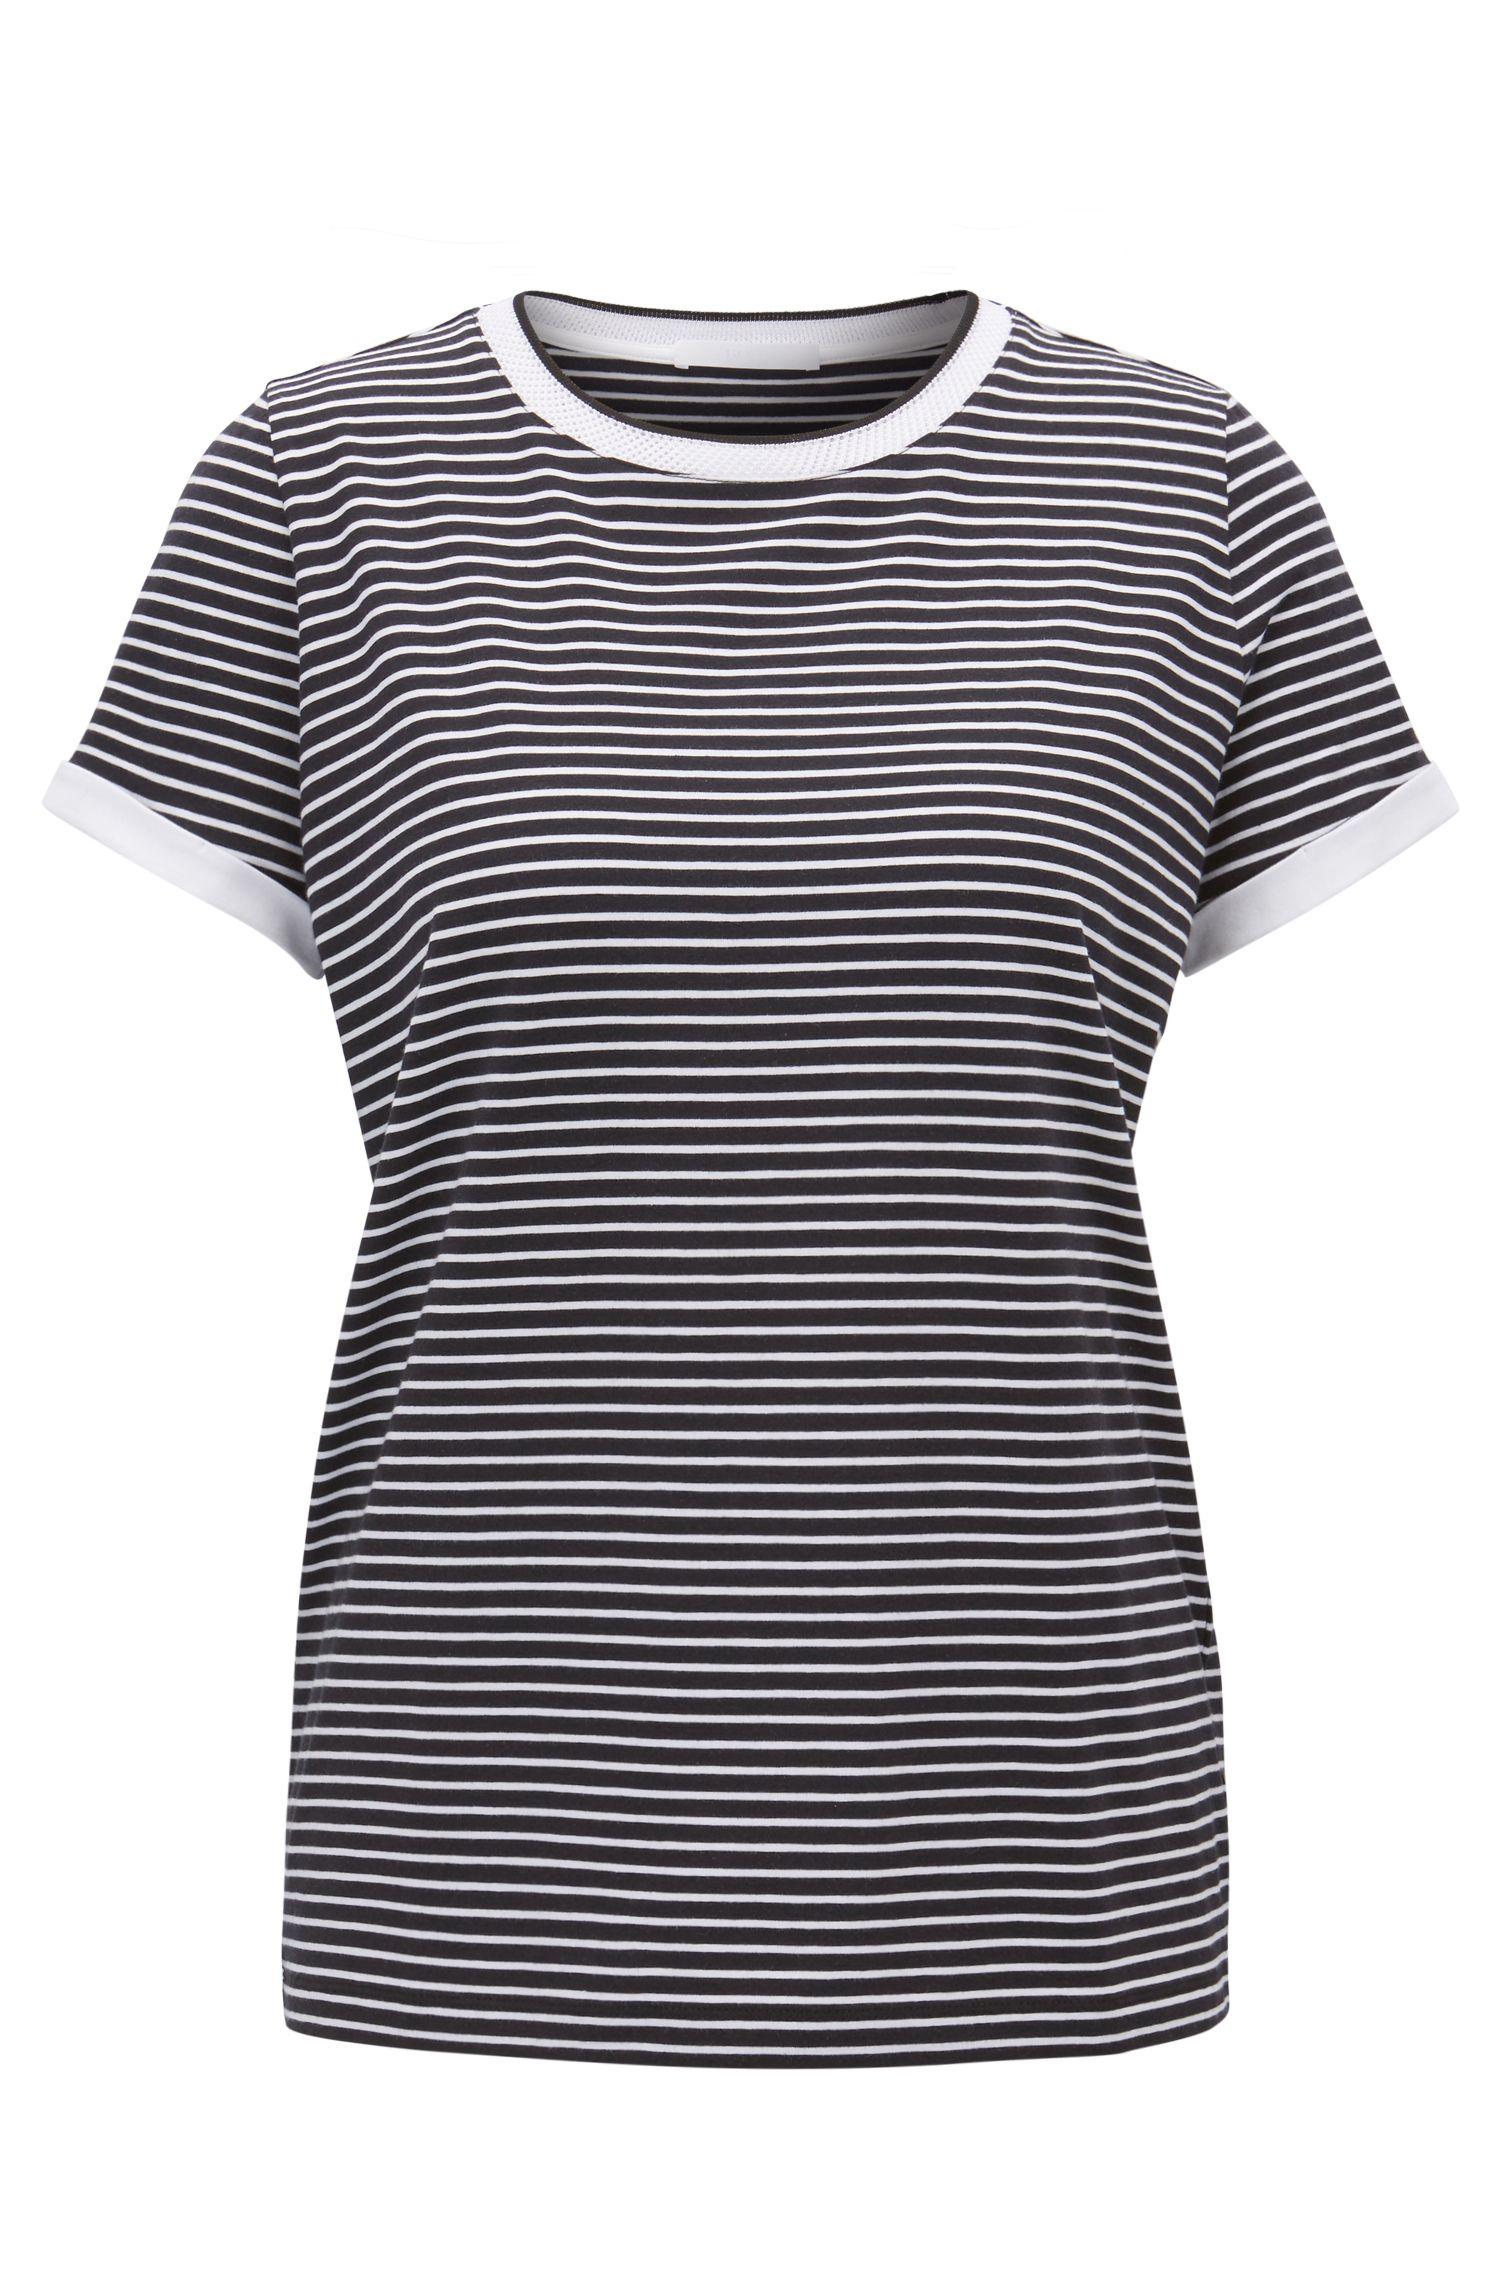 Gestreiftes T-Shirt aus Stretch-Gewebe mit Mesh-Ausschnitt, Gemustert